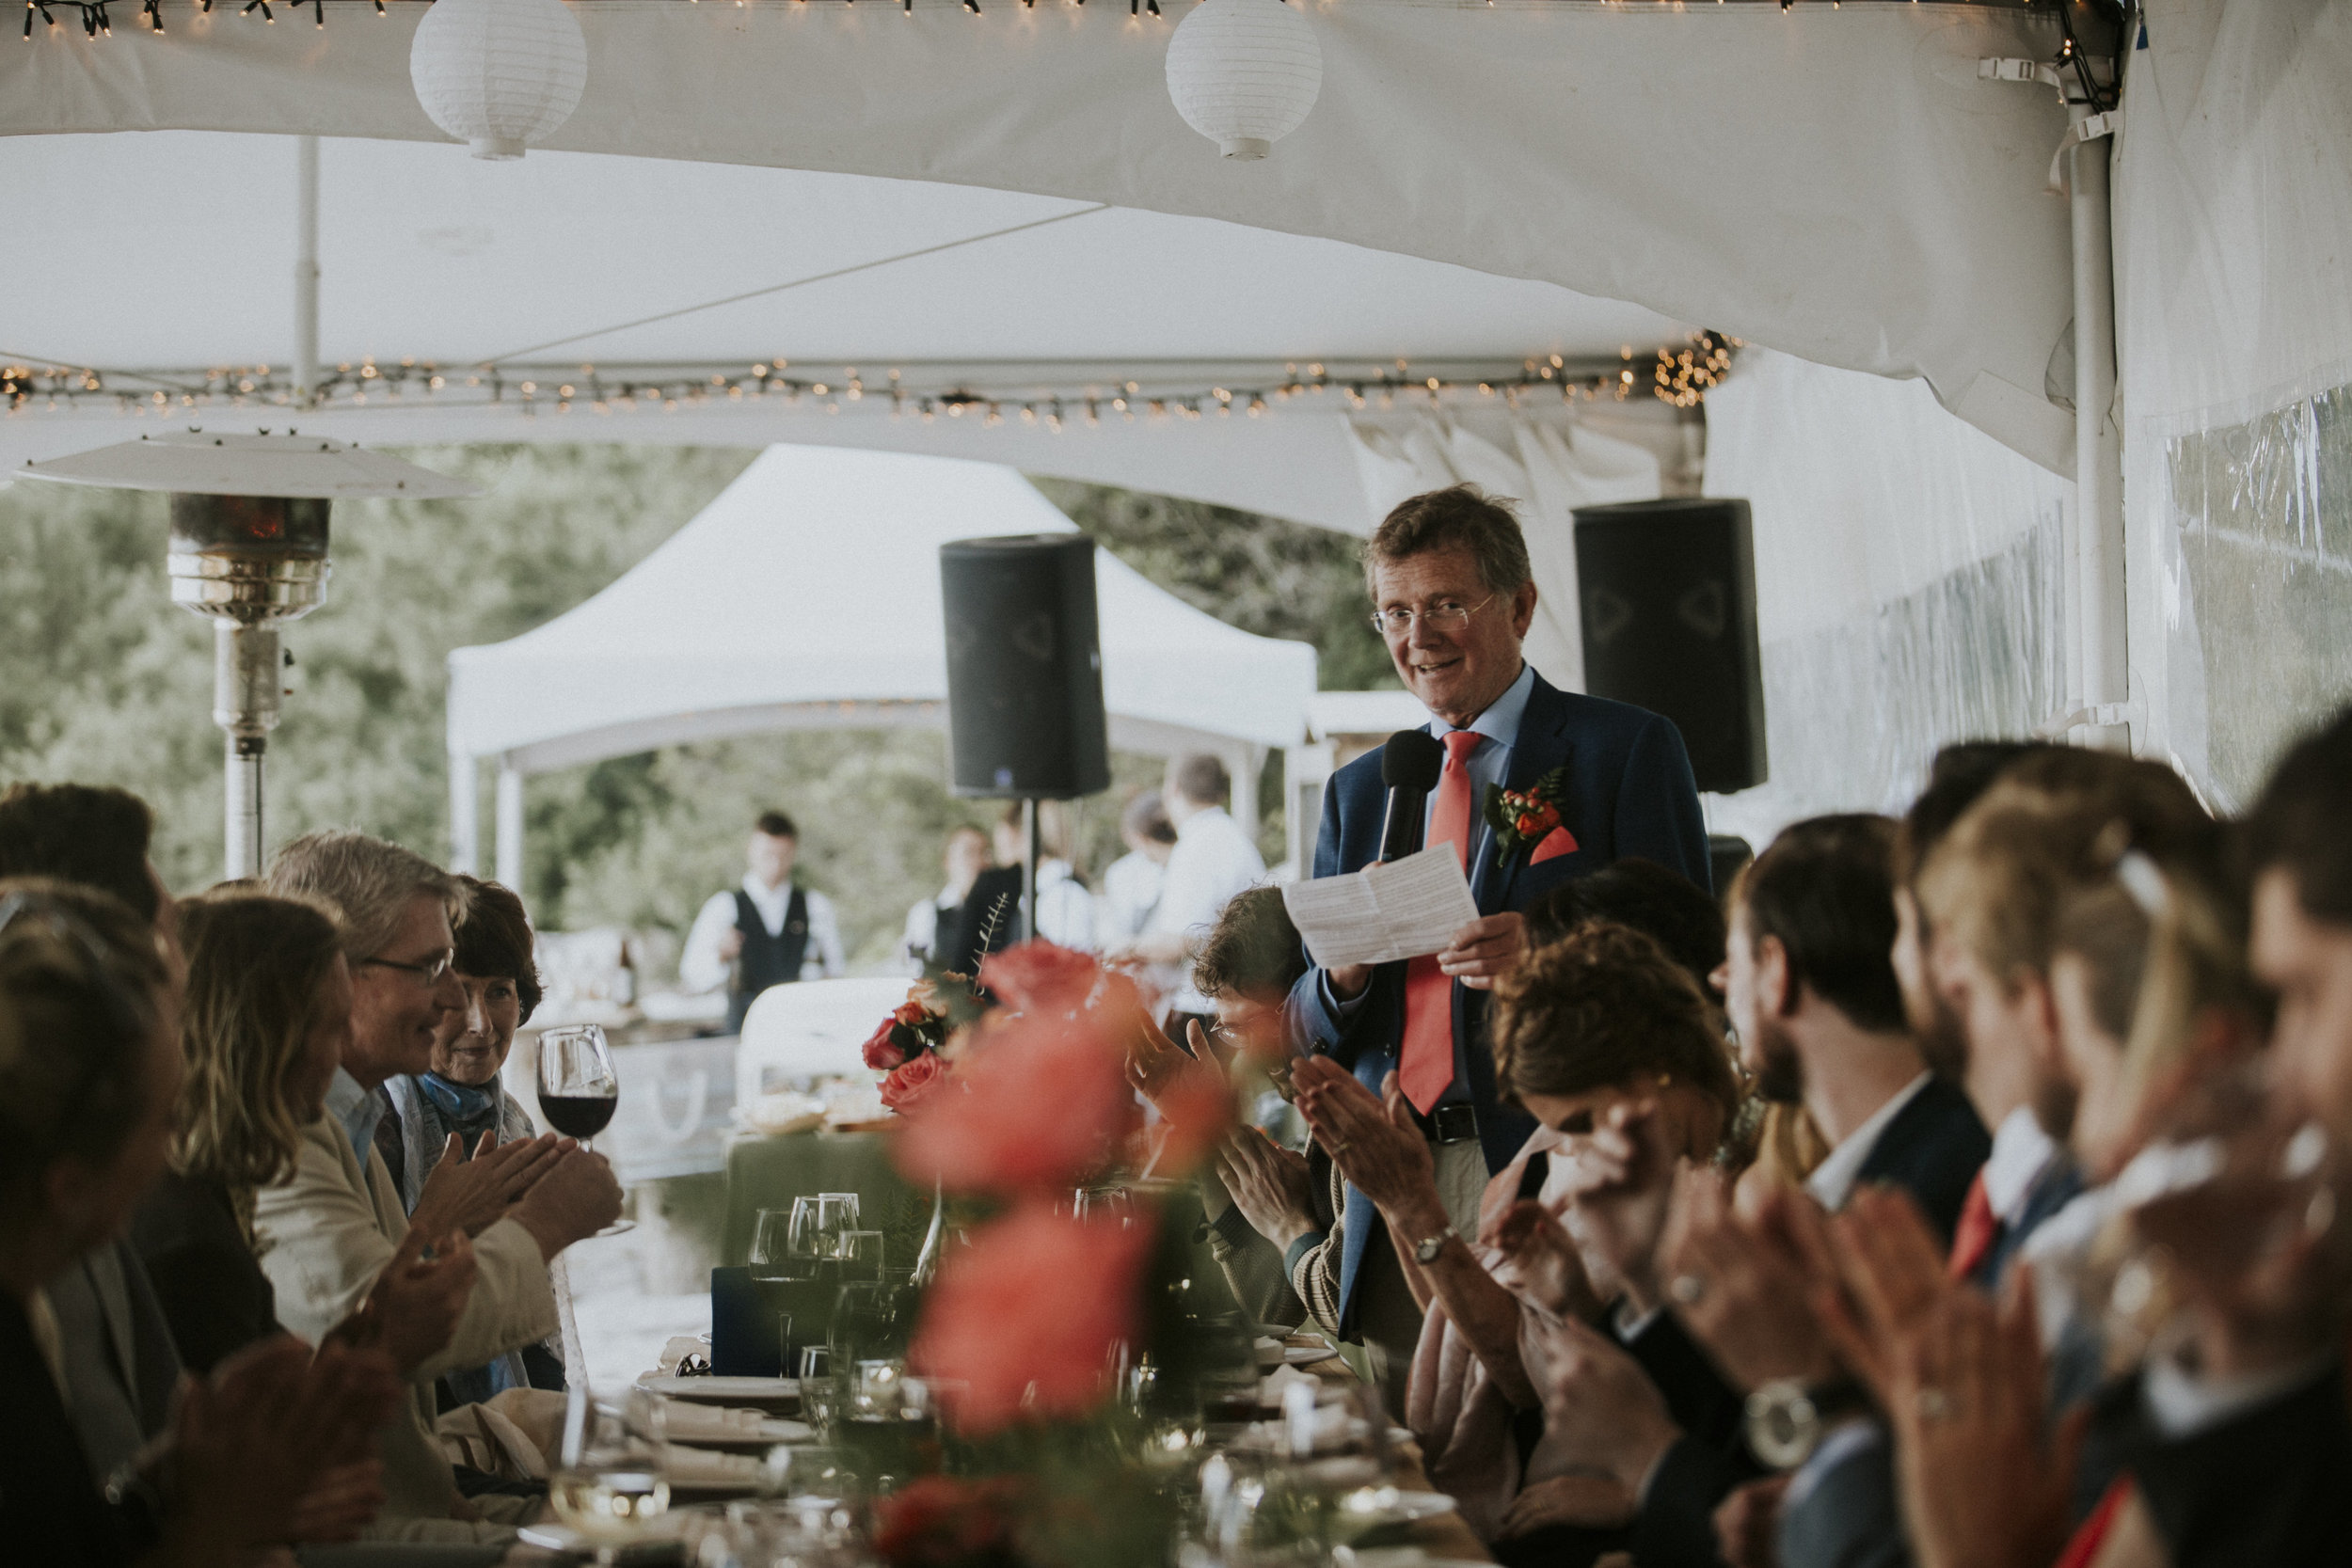 father of groom speaks at reception beach wedding wickaninnish inn